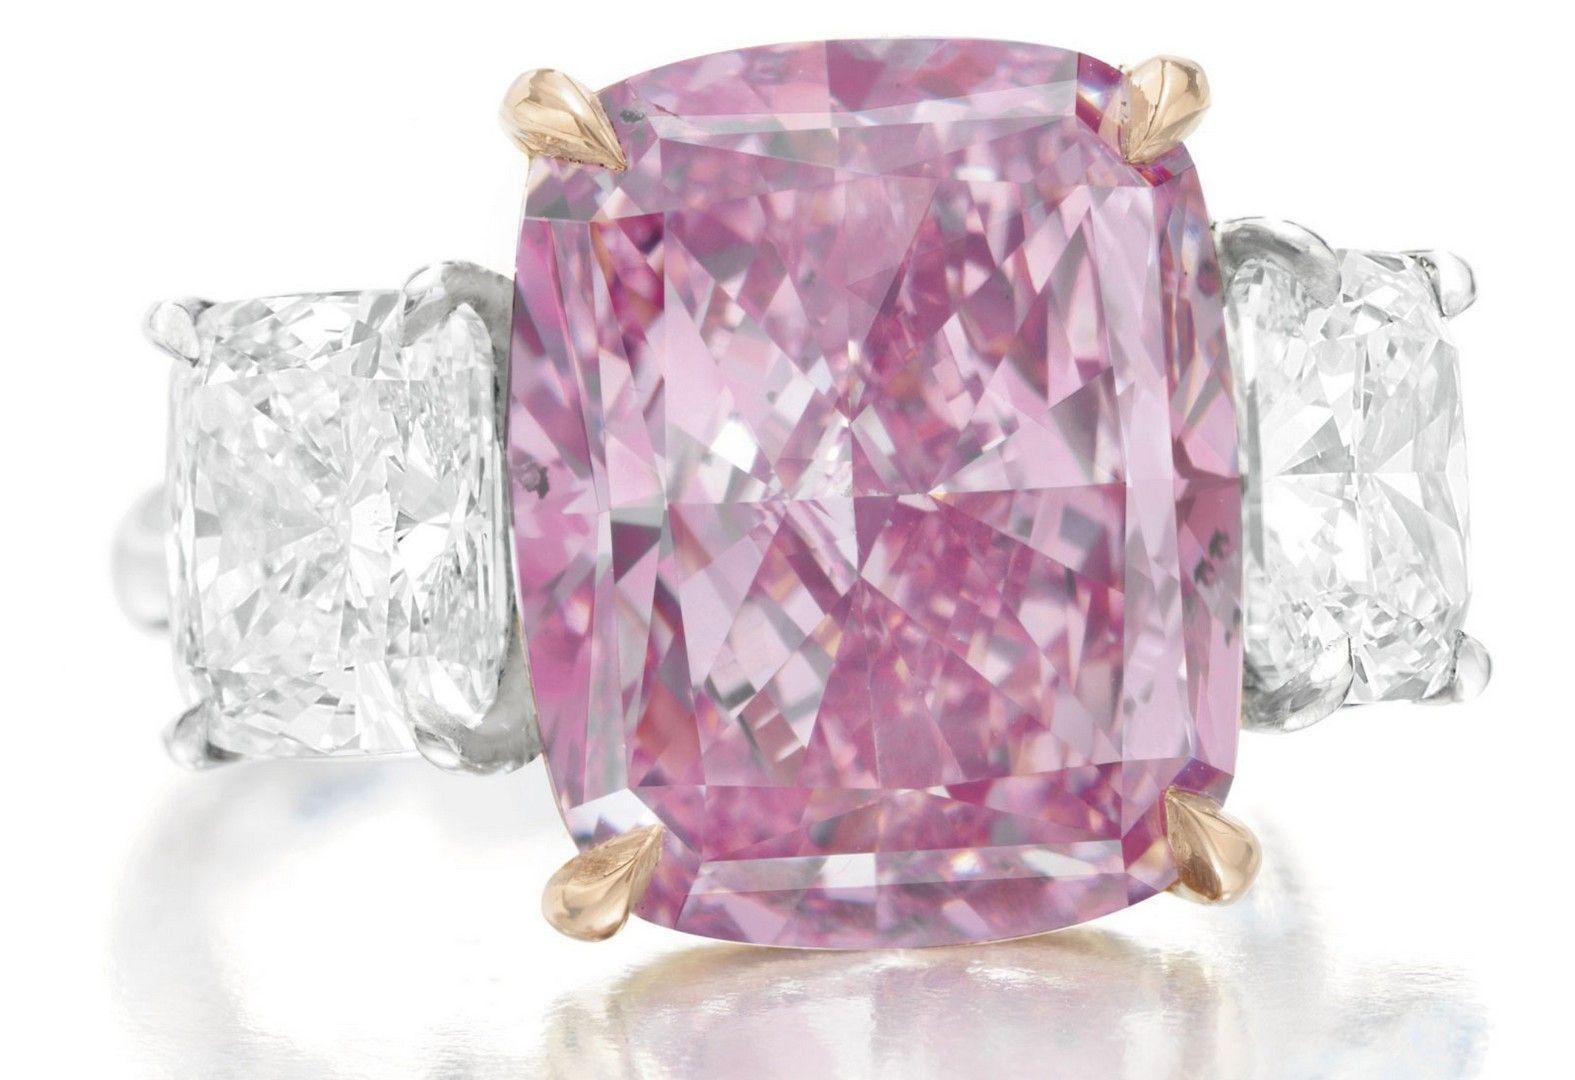 HD Perfect Pink Diamond wallpaper